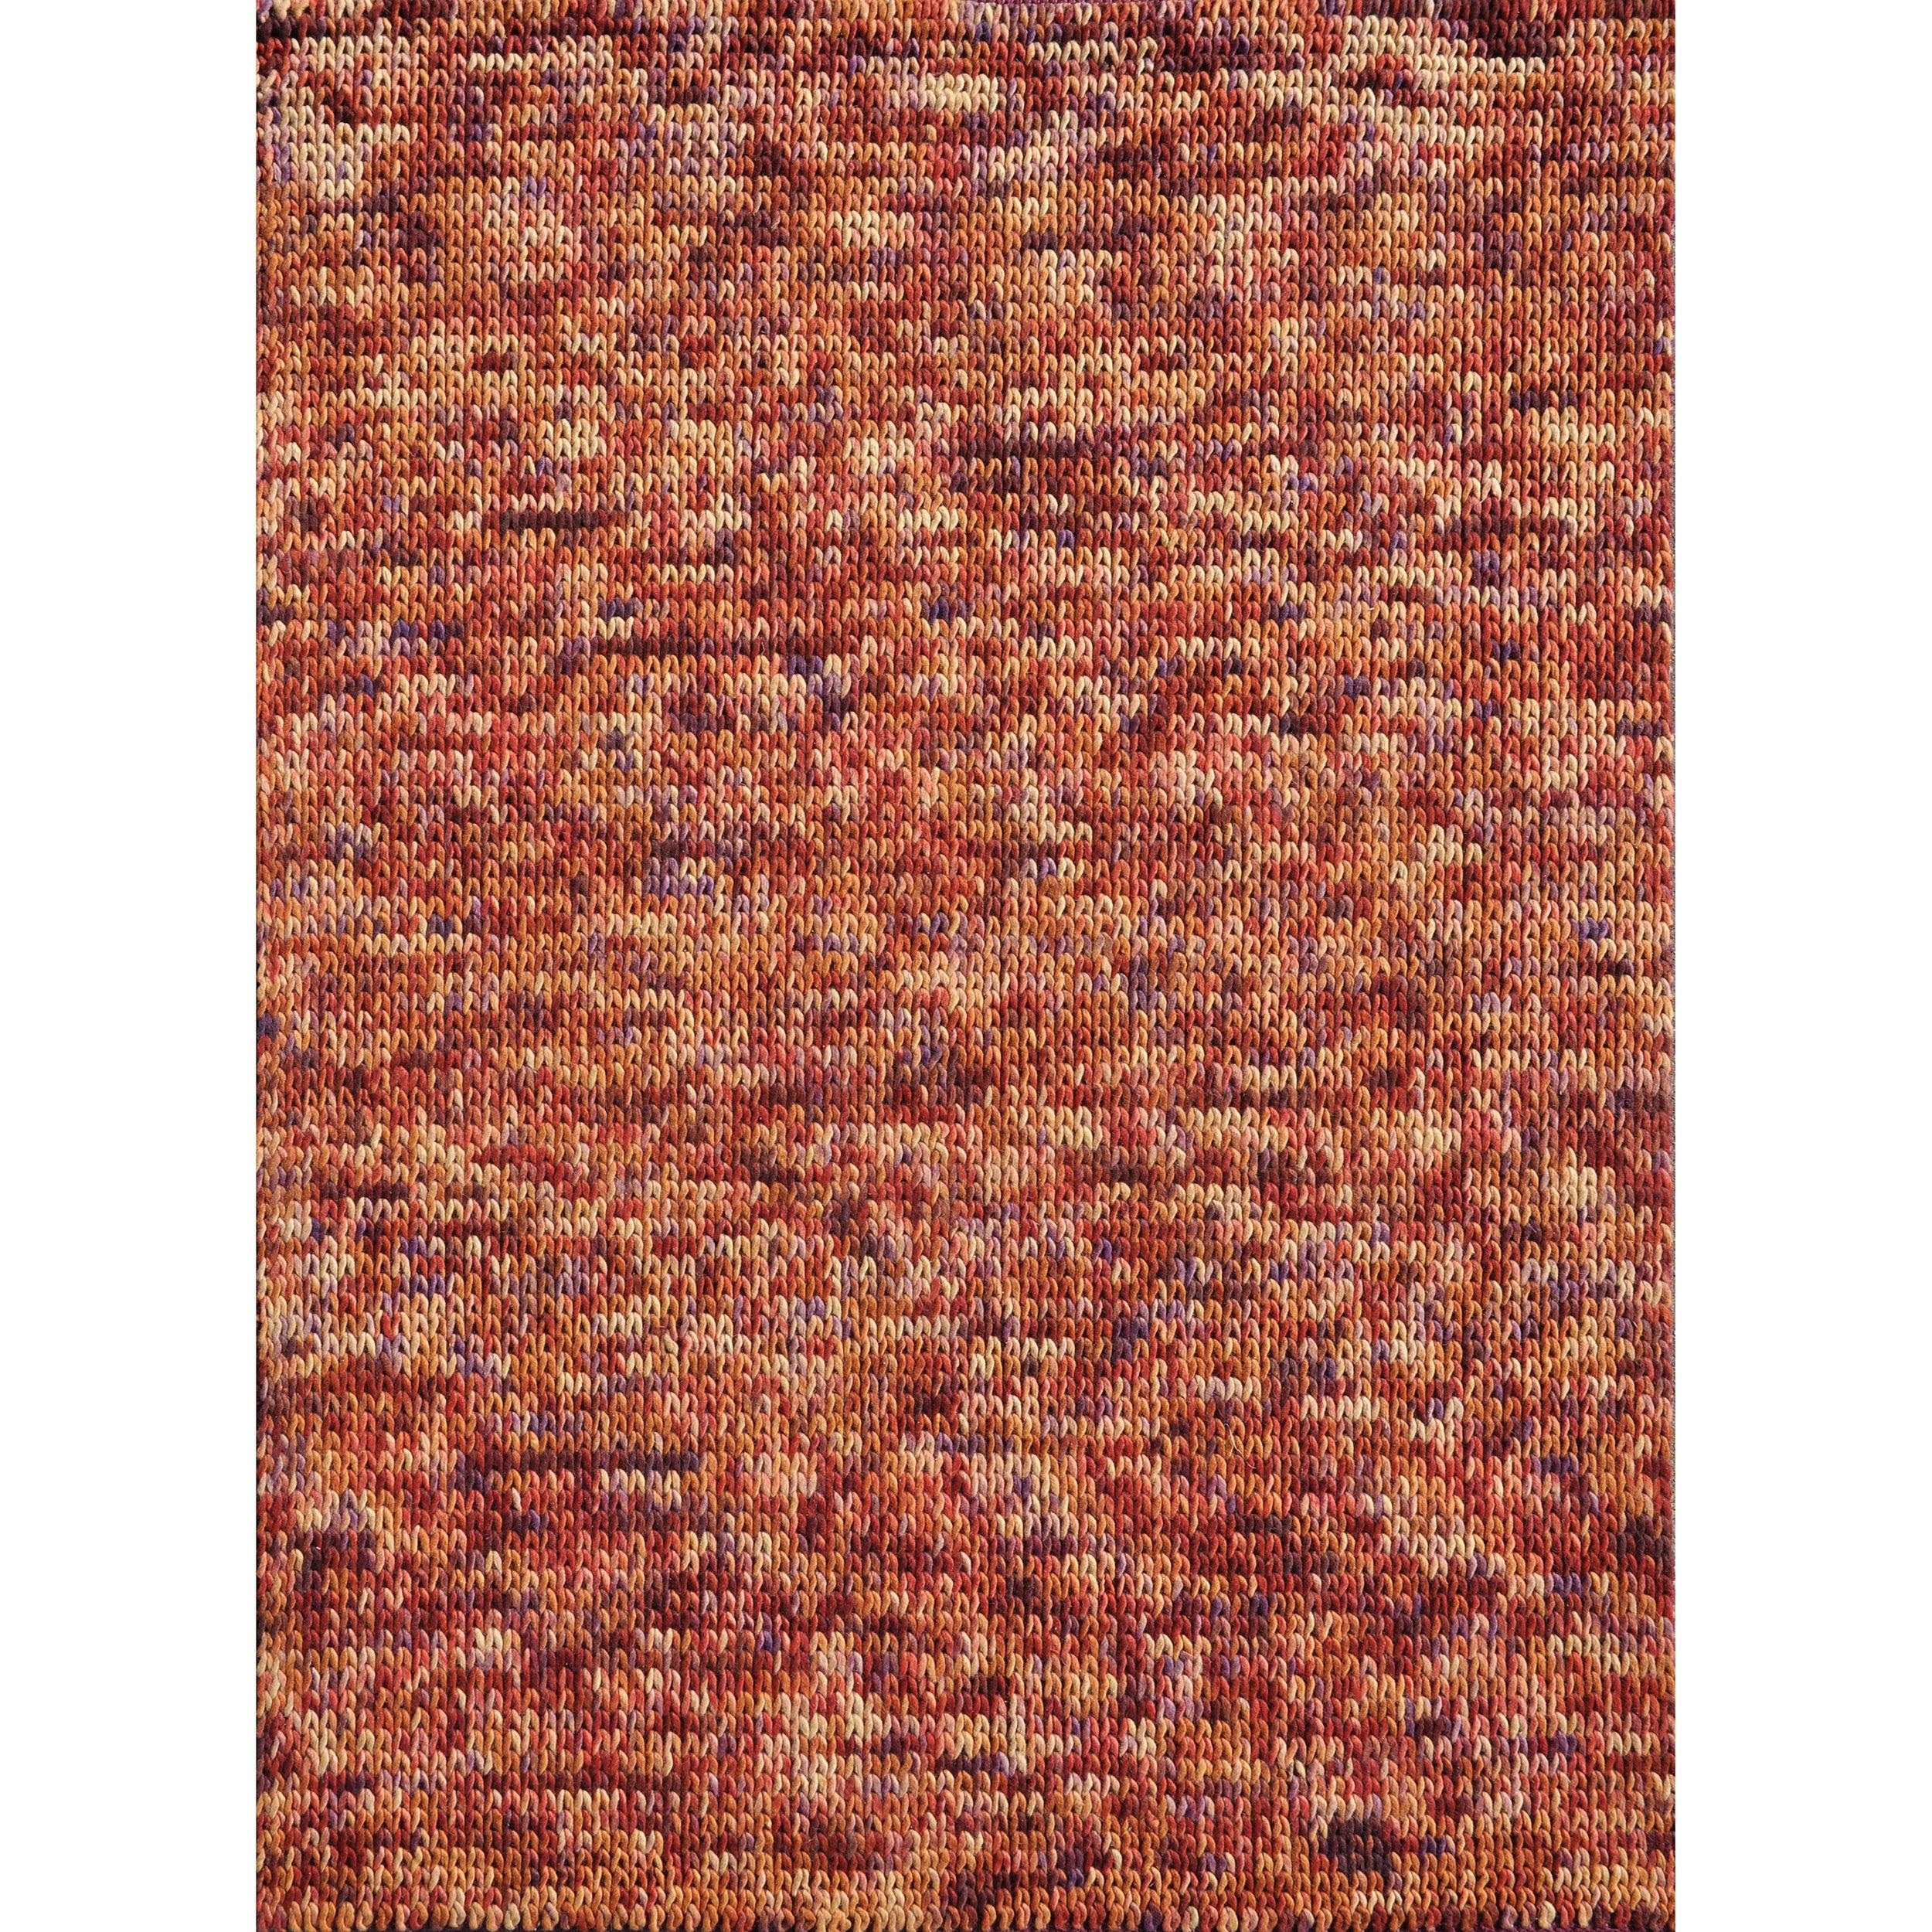 Hand-woven Gilderoy Spice Wool Rug (7'6 x 9'6)